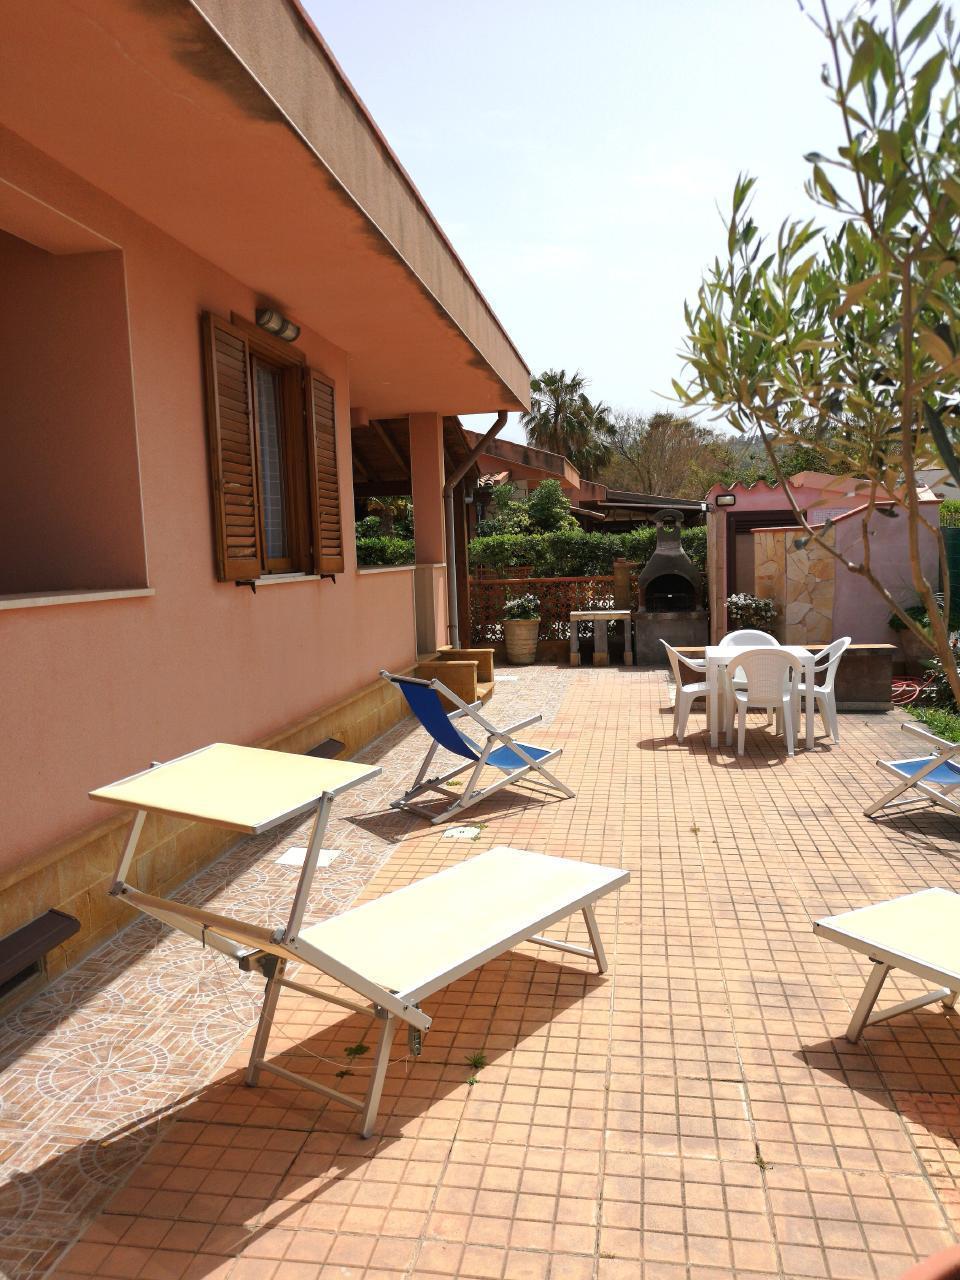 Maison de vacances Costa Mediterranea Ferienhaus (2144931), Cefalù, Palermo, Sicile, Italie, image 24